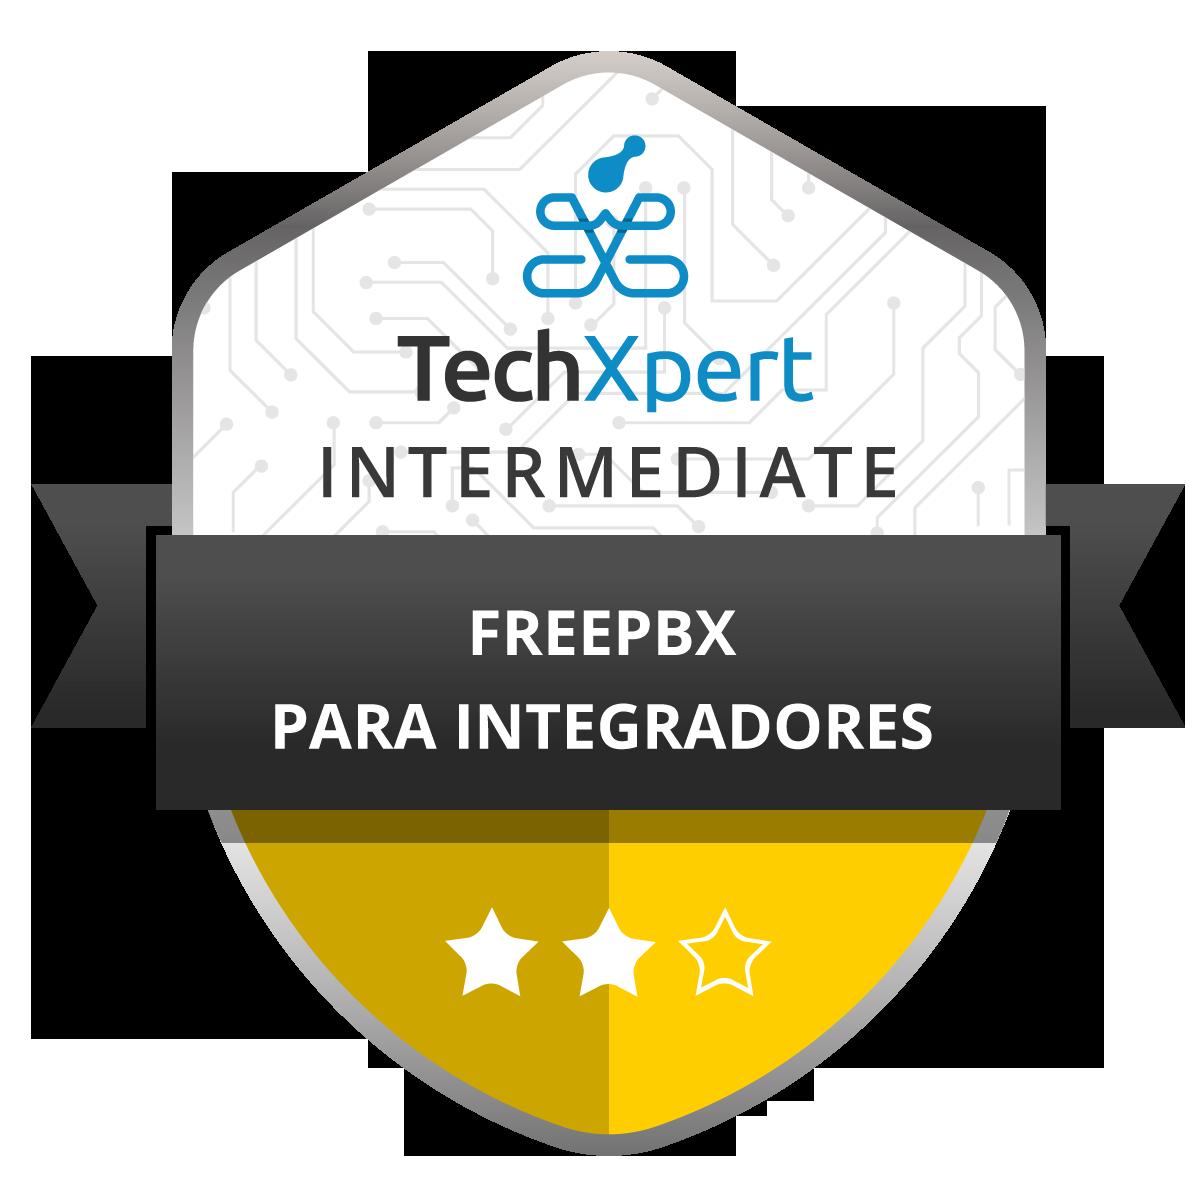 FreePBX para Integradores